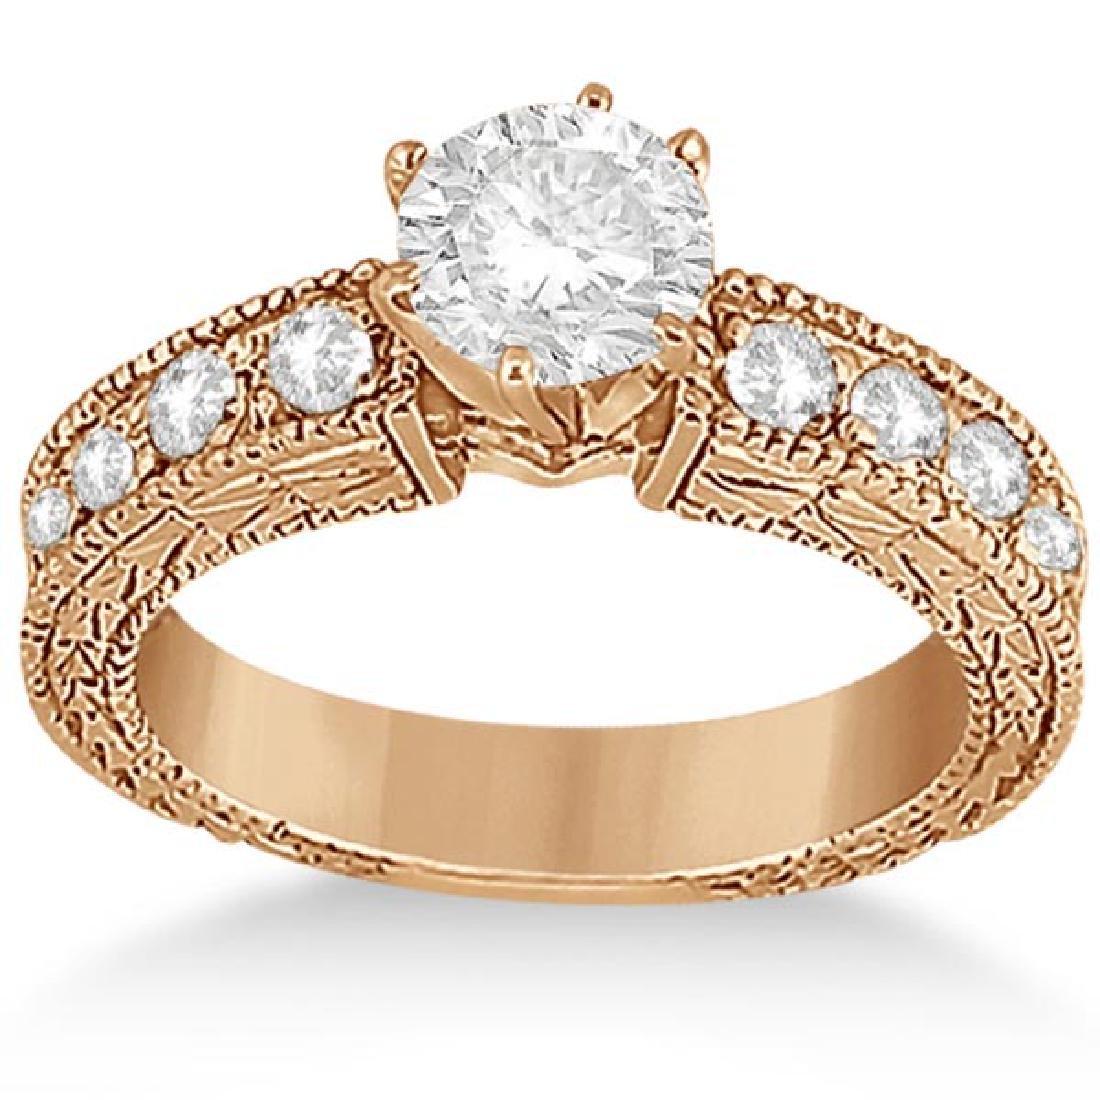 1.50 ctw Antique Style Diamond Engagement Ring 14K Rose